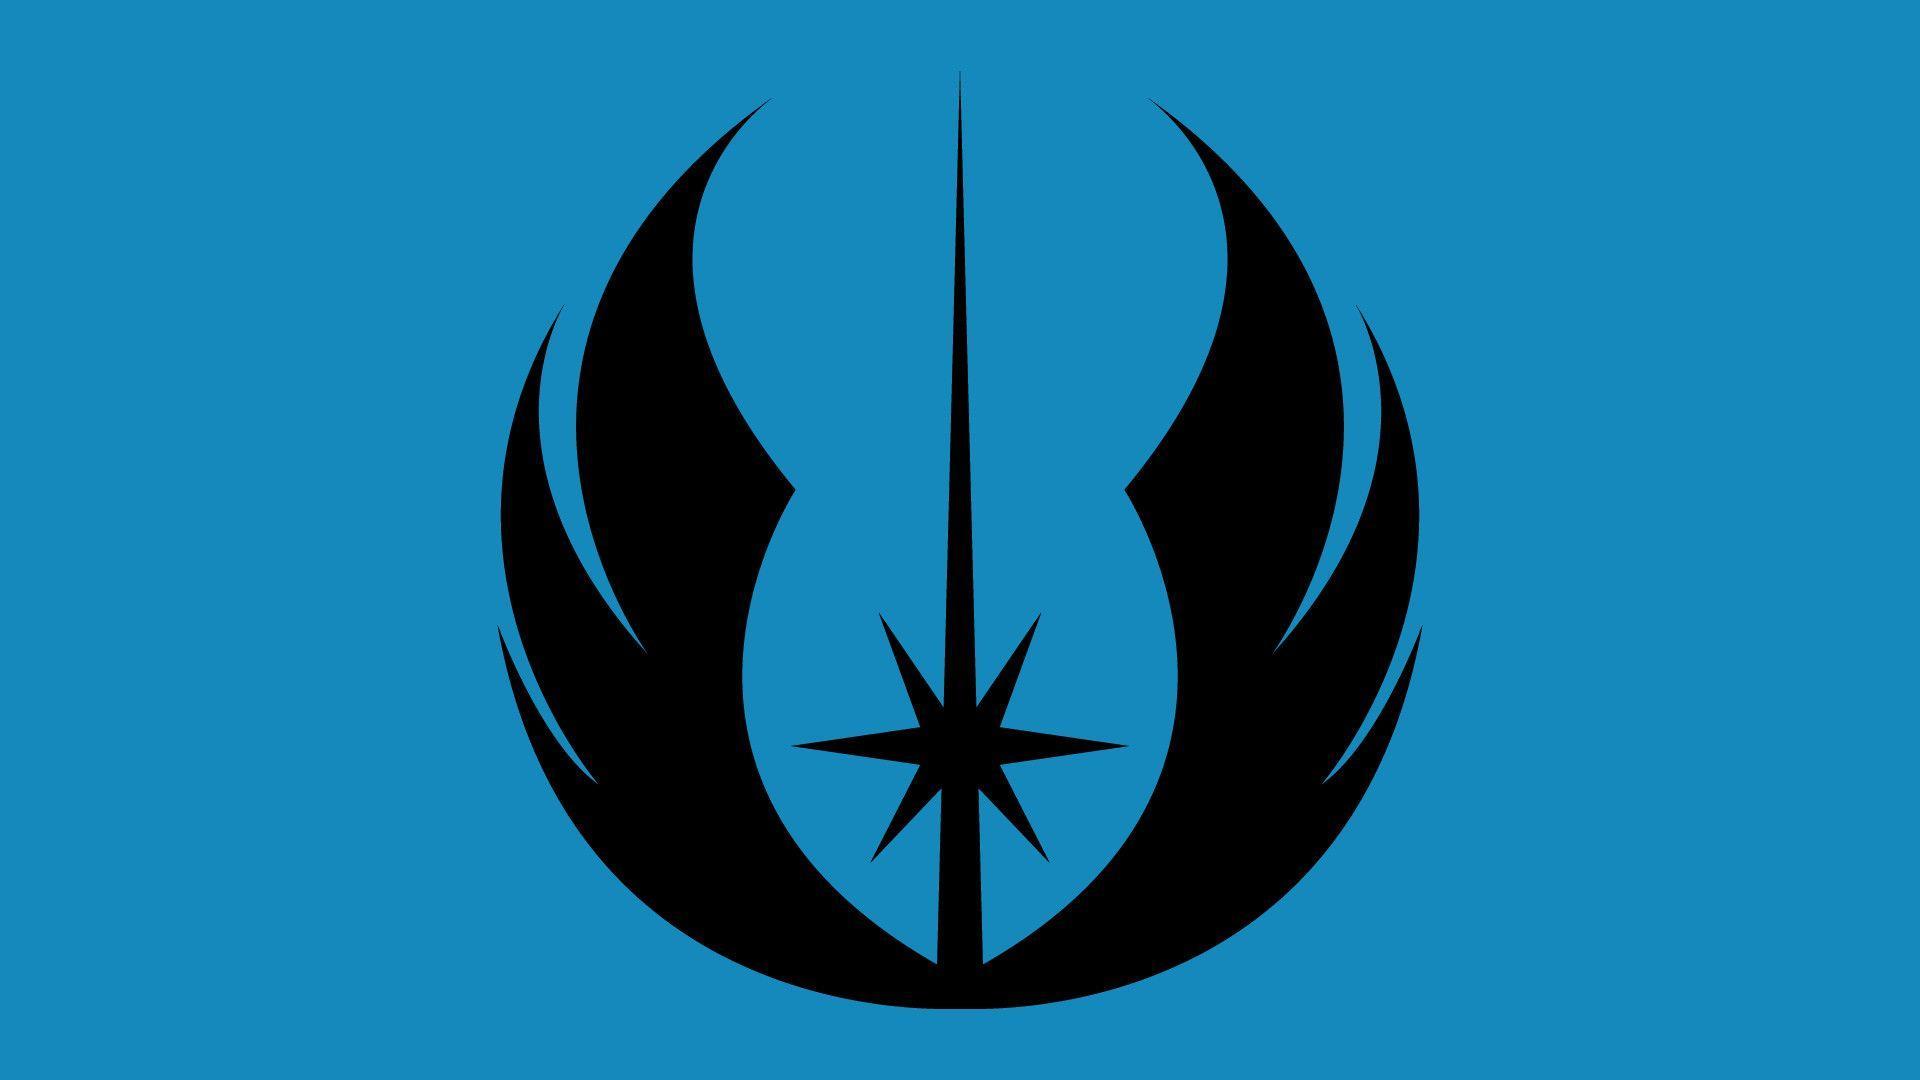 Jedi Symbol Wallpapers Top Free Jedi Symbol Backgrounds Wallpaperaccess